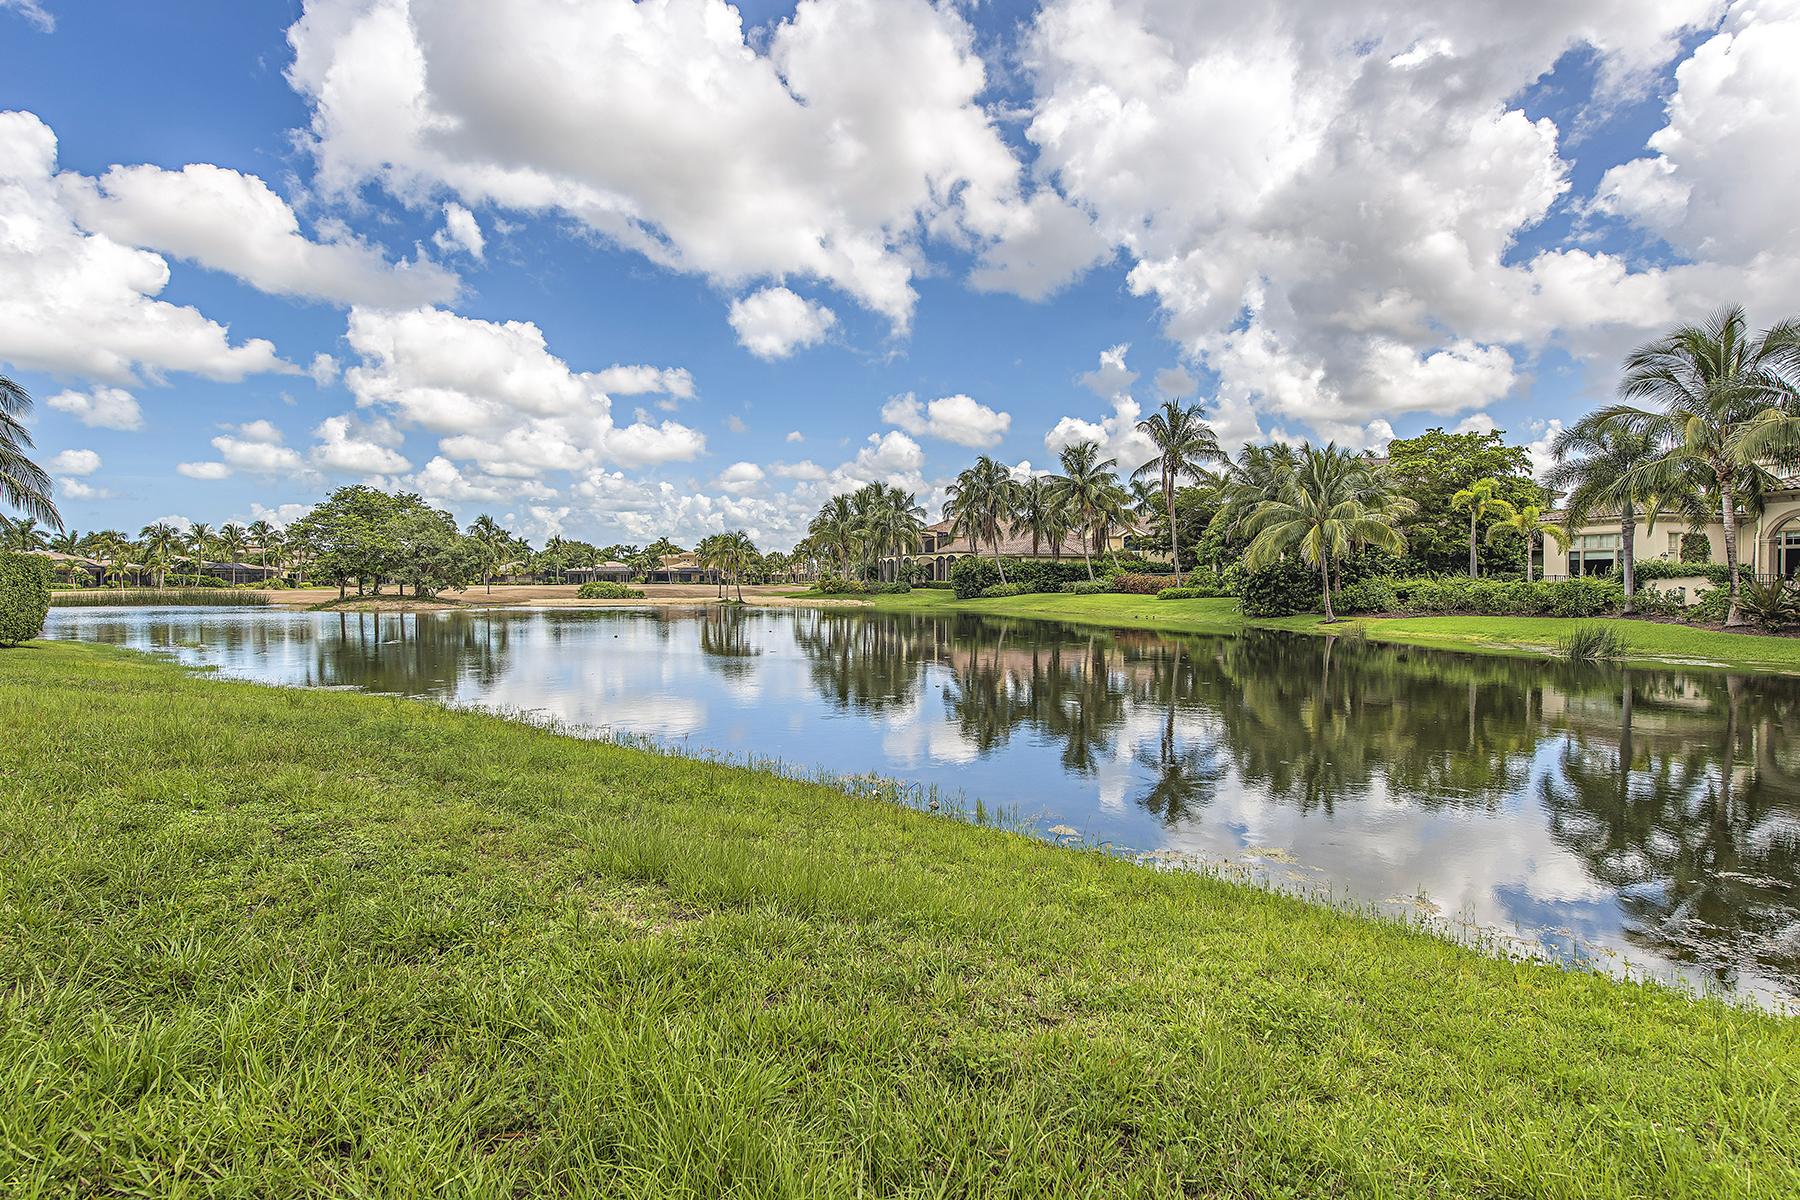 Land for Sale at Naples 1829 Plumbago Ln Naples, Florida, 34105 United States